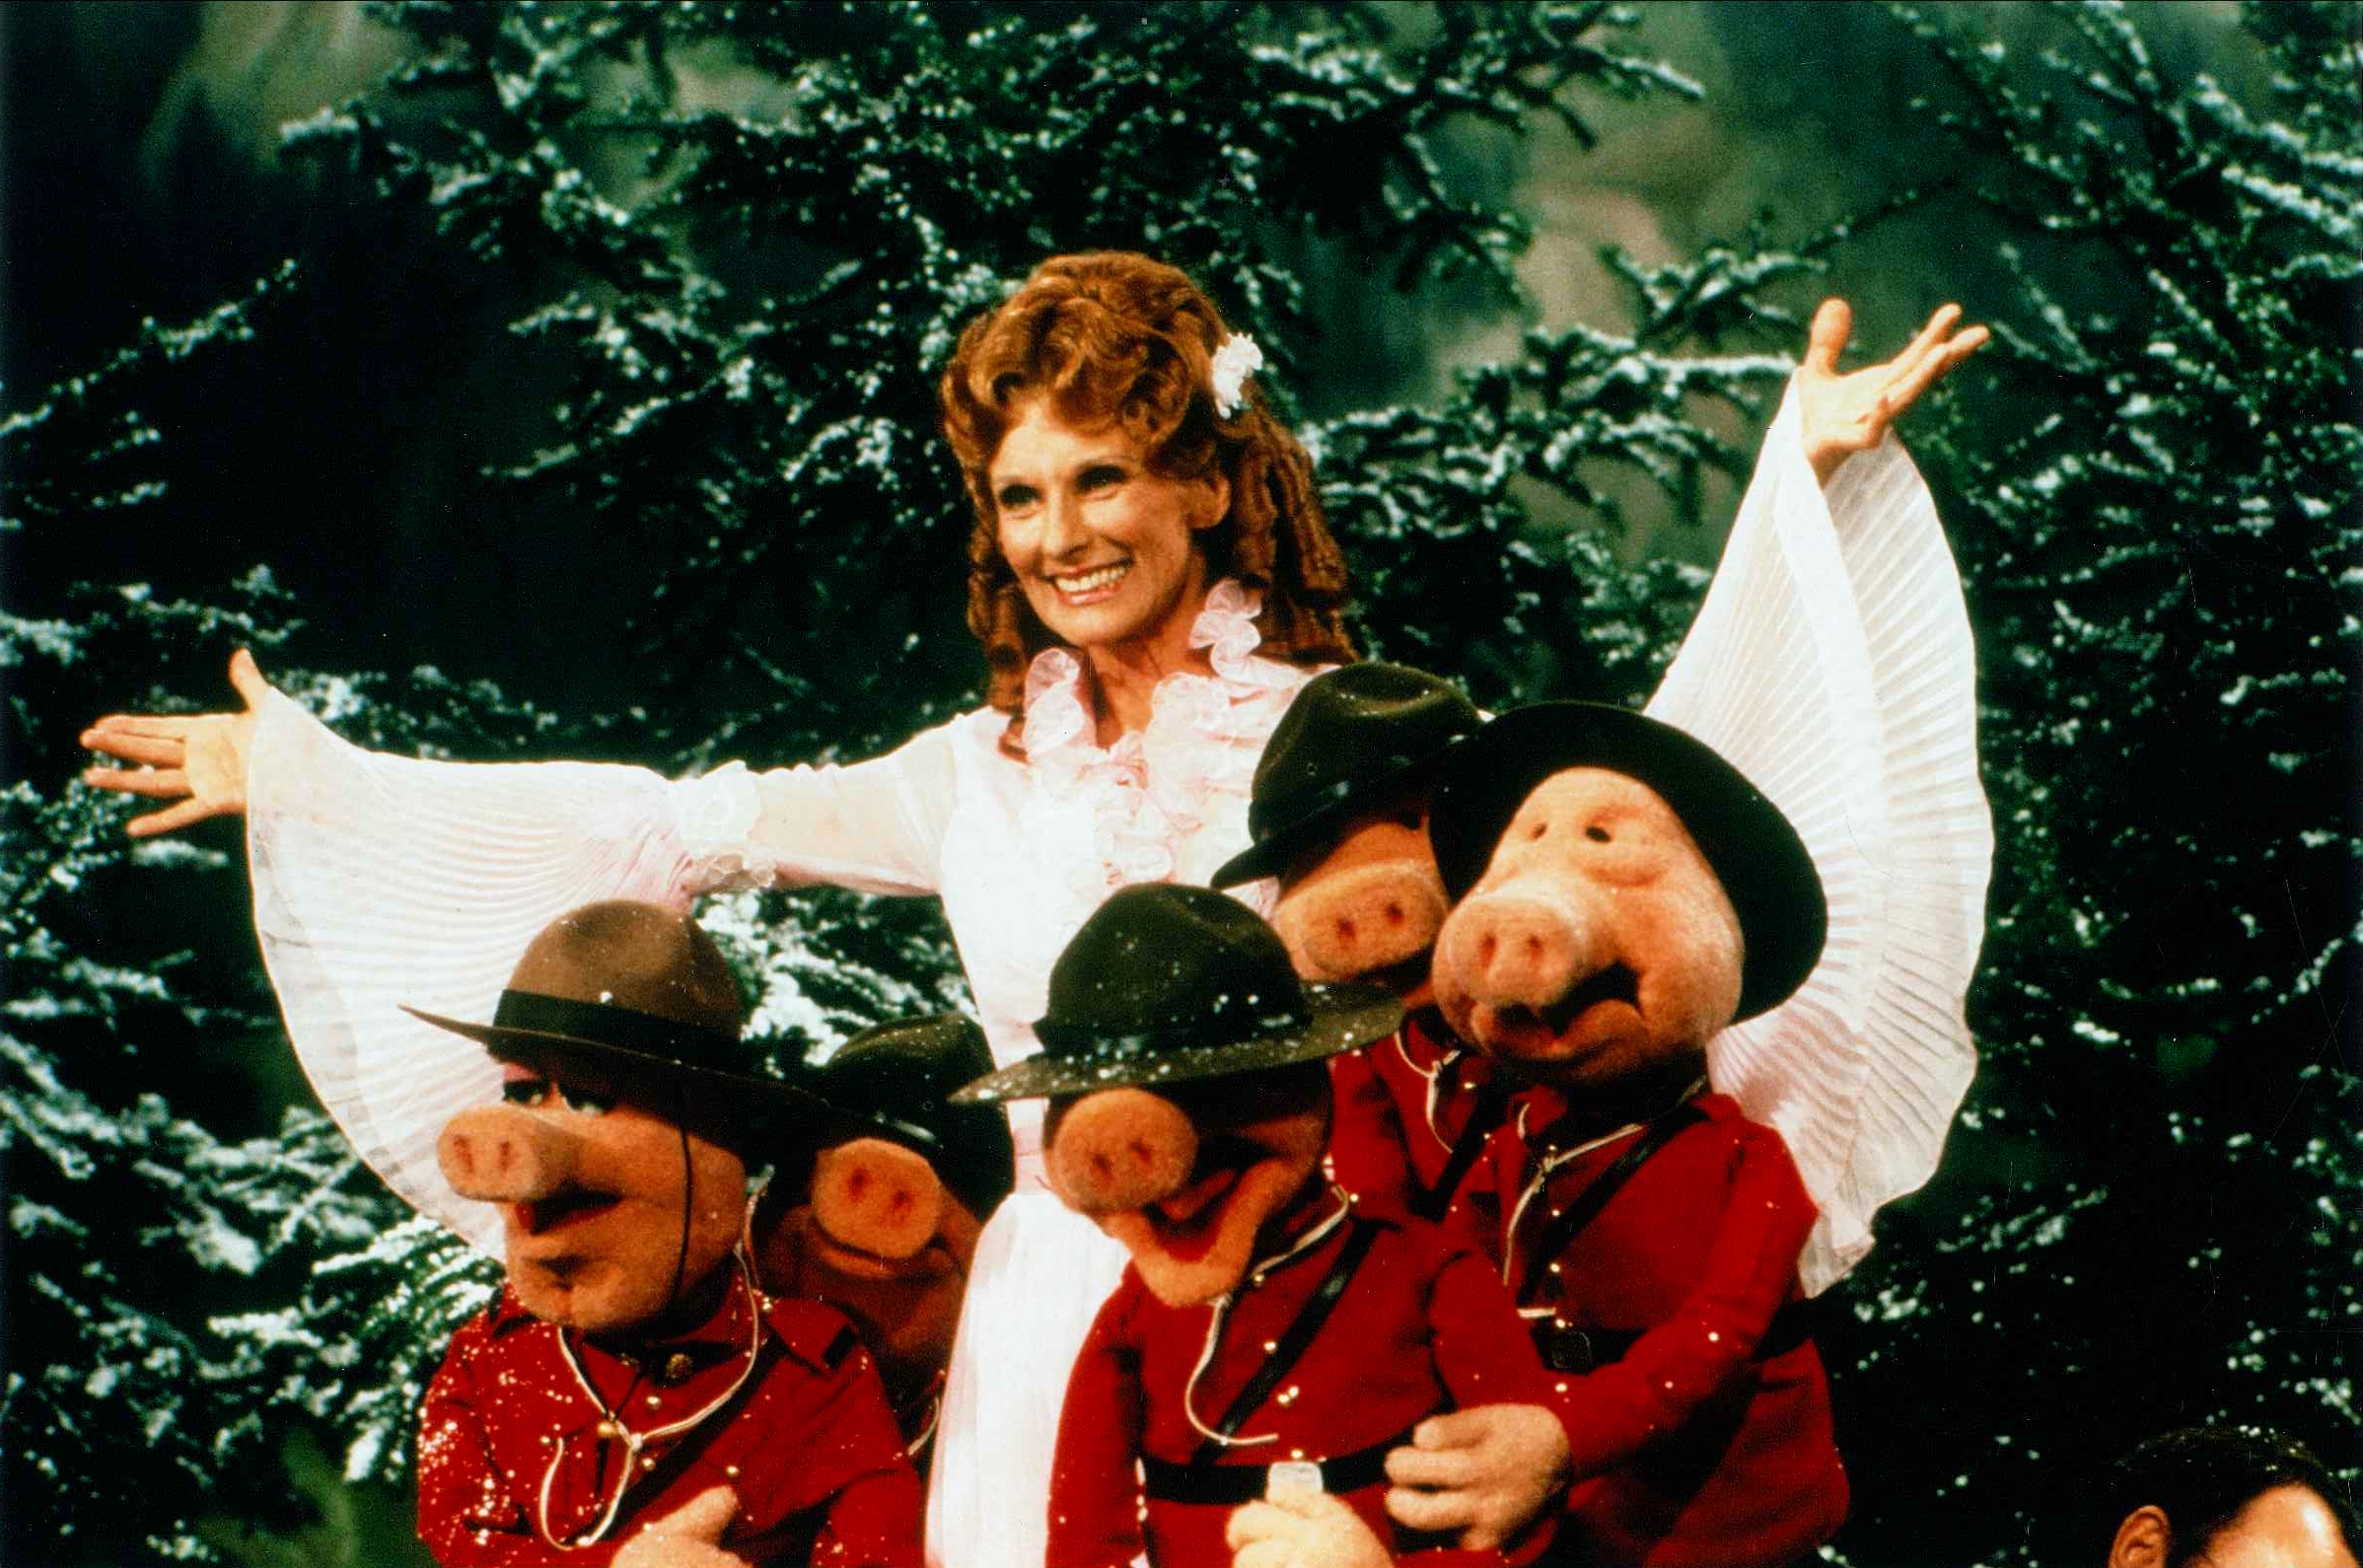 Cloris Leachman muppet show